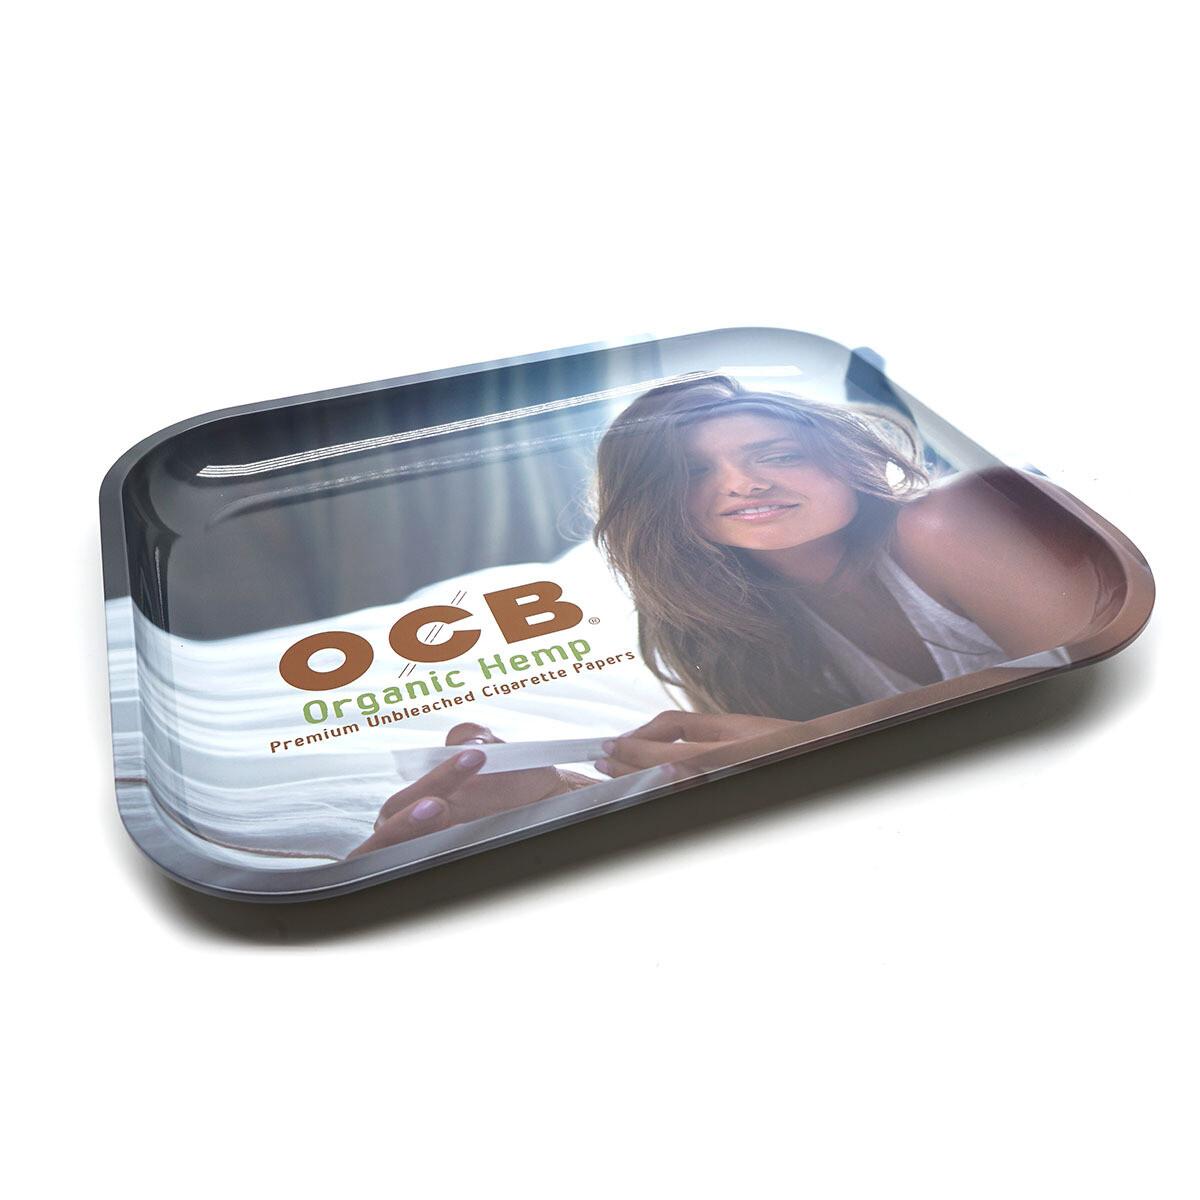 OCB - Organic hemp tray Small